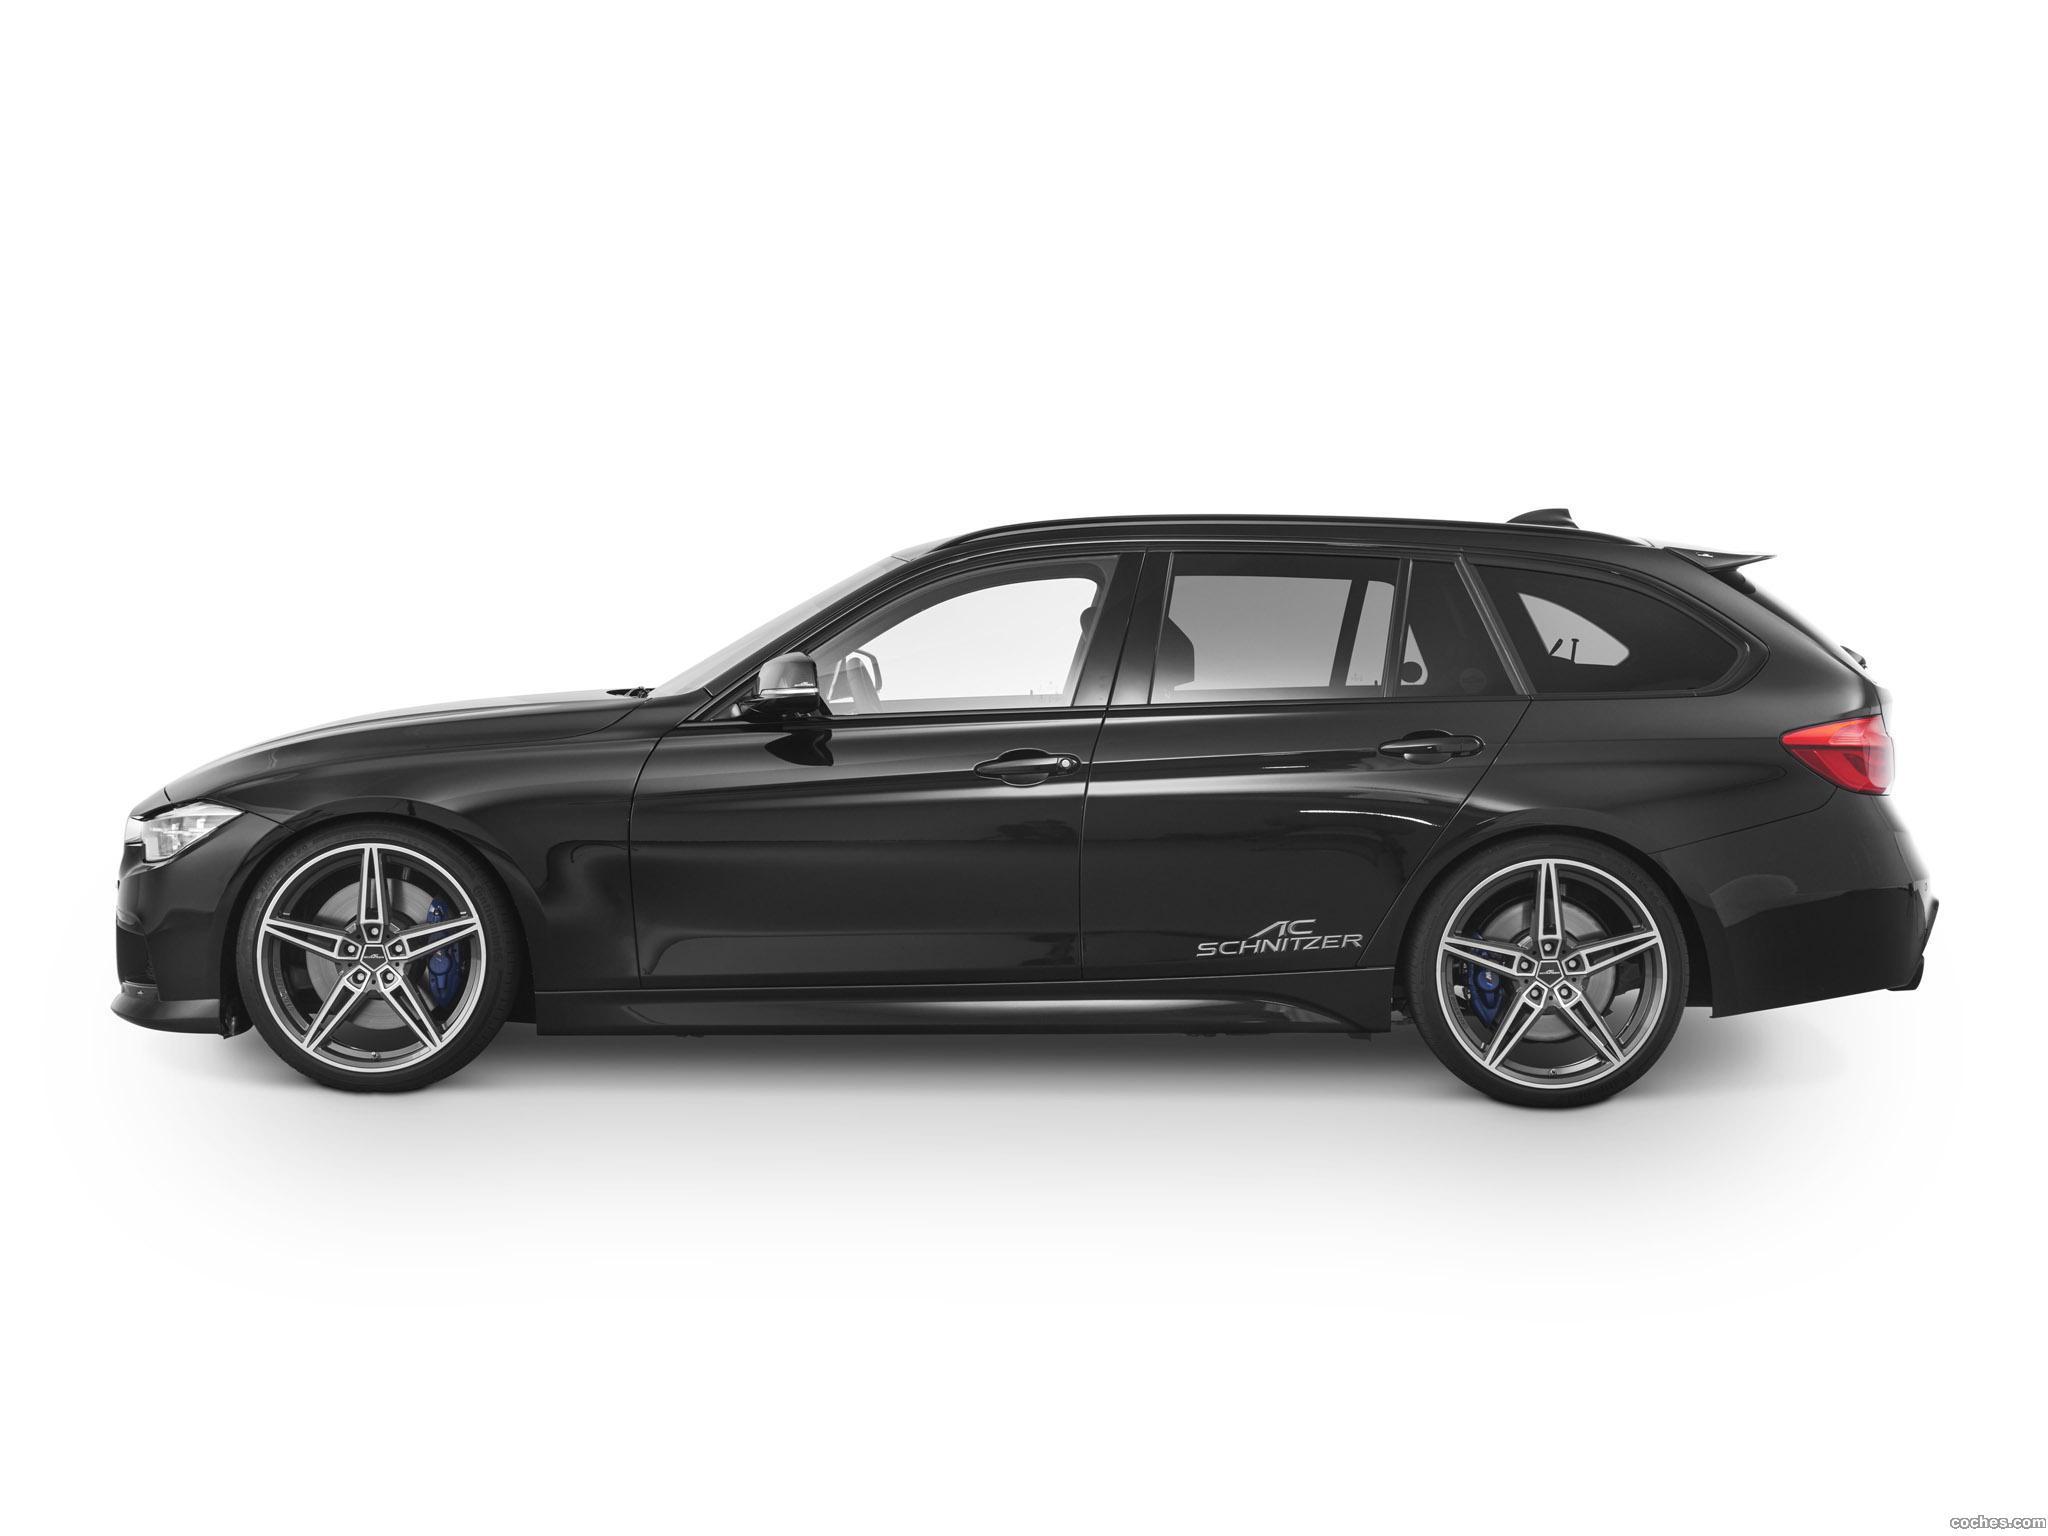 Foto 4 de AC-Schnitzer BMW Serie 3 ACS3 Touring F31 2015